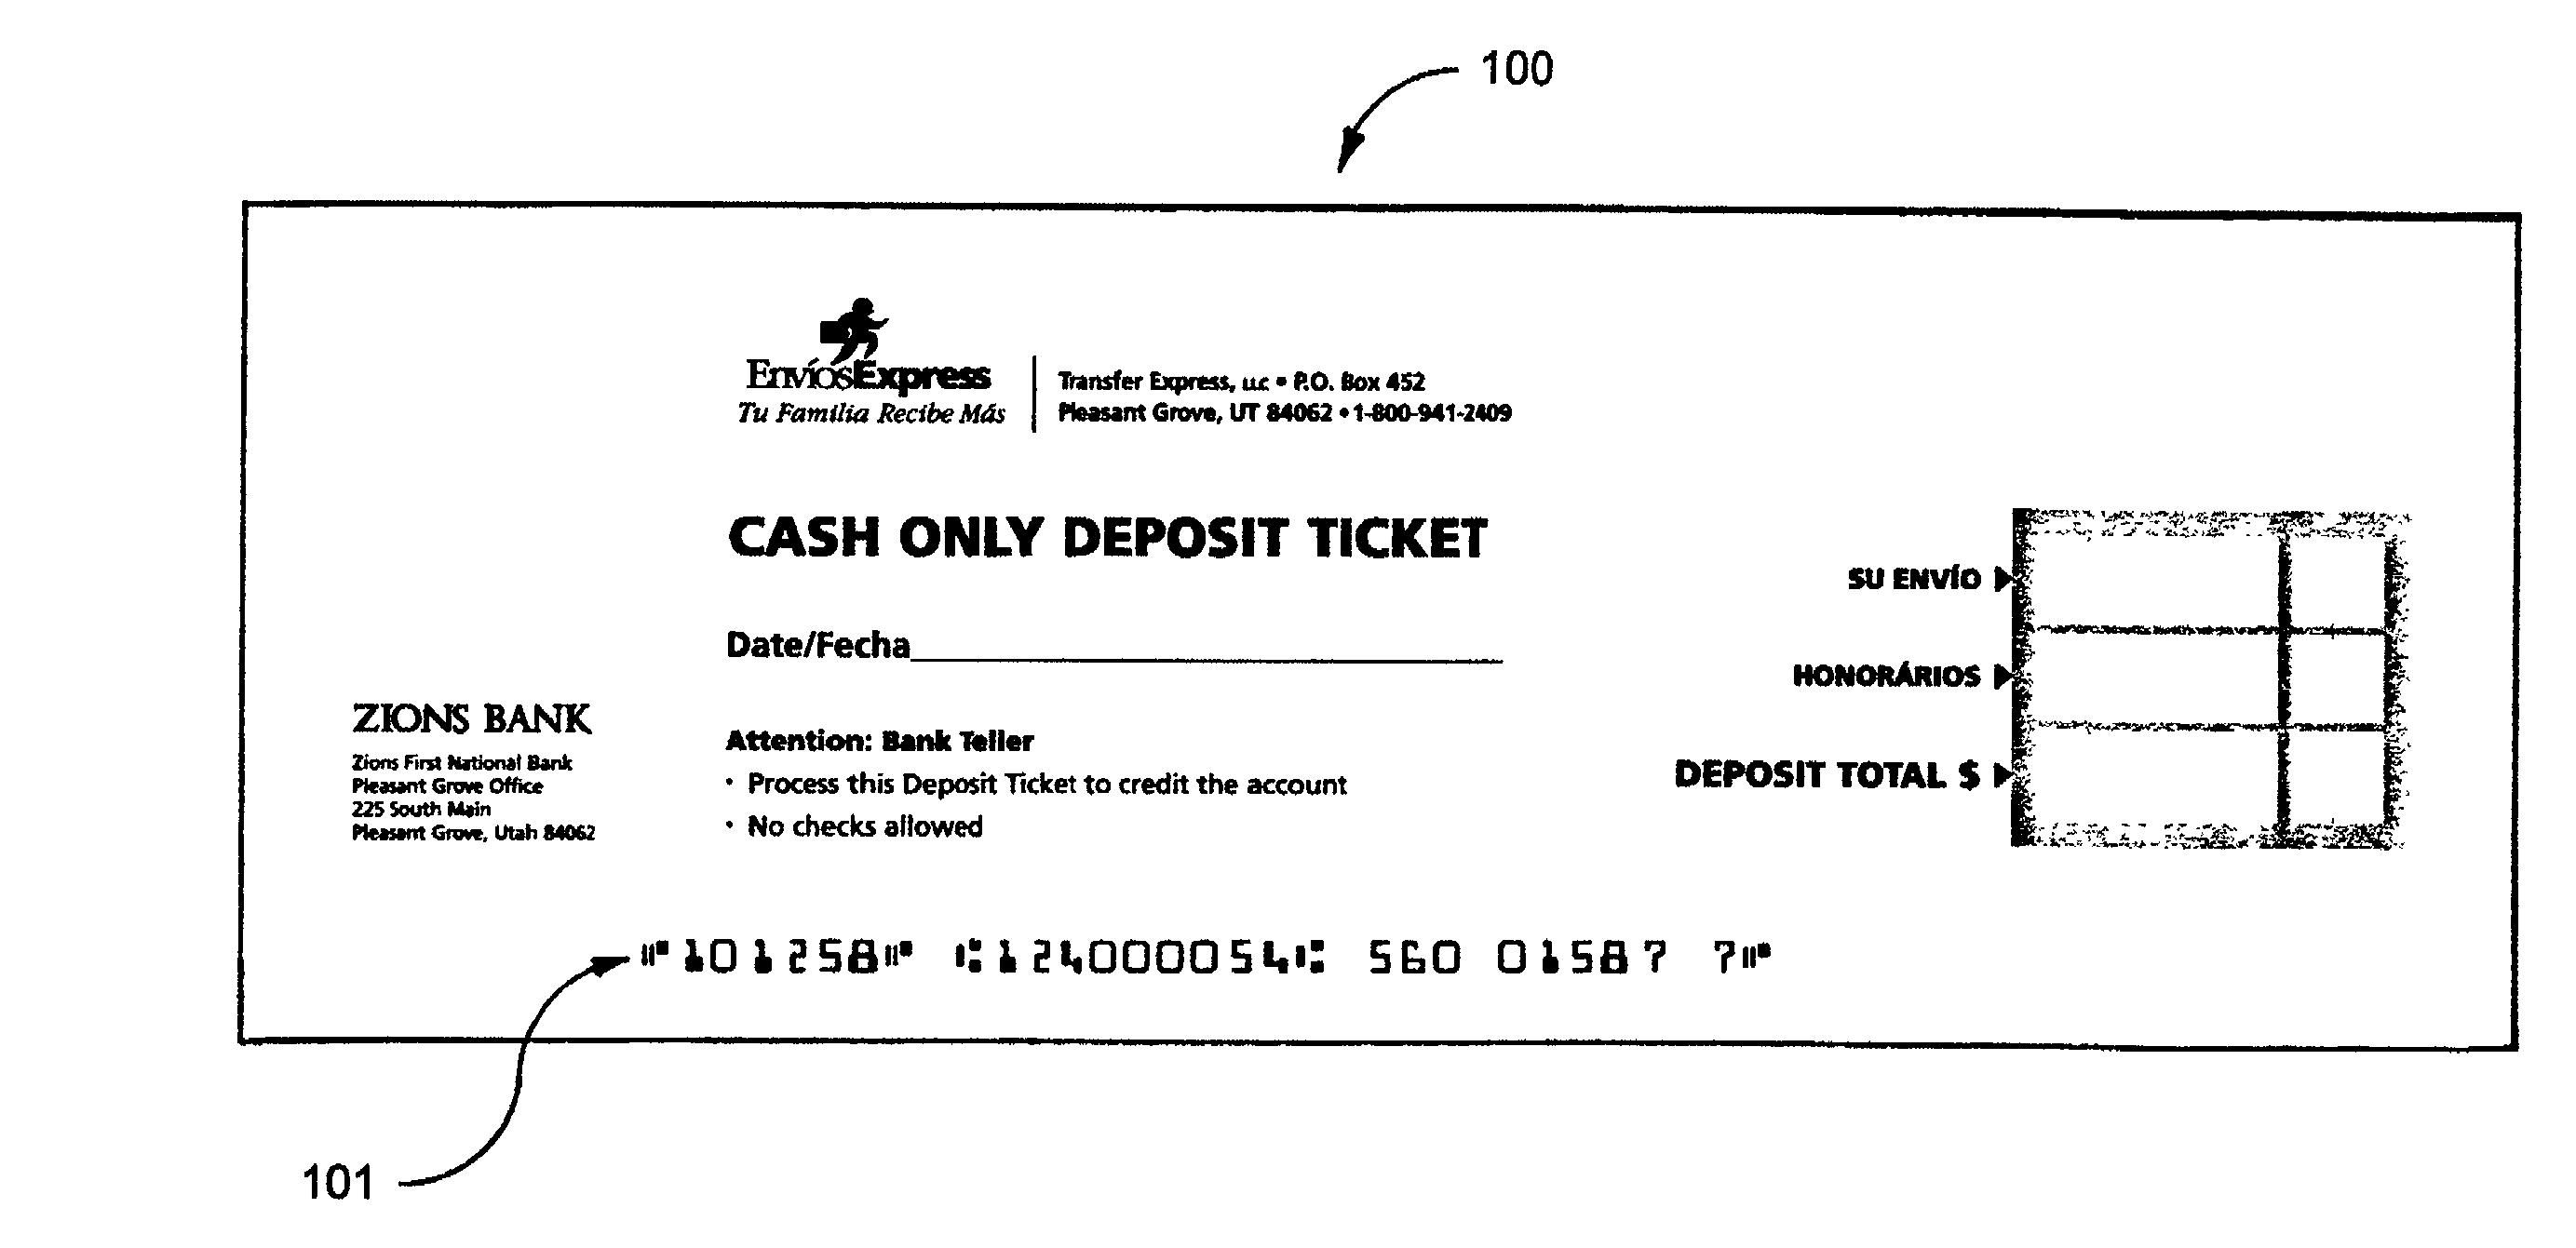 patent us20020077971 bank based international money Online Money Wiring Services Wiring Money Western Union